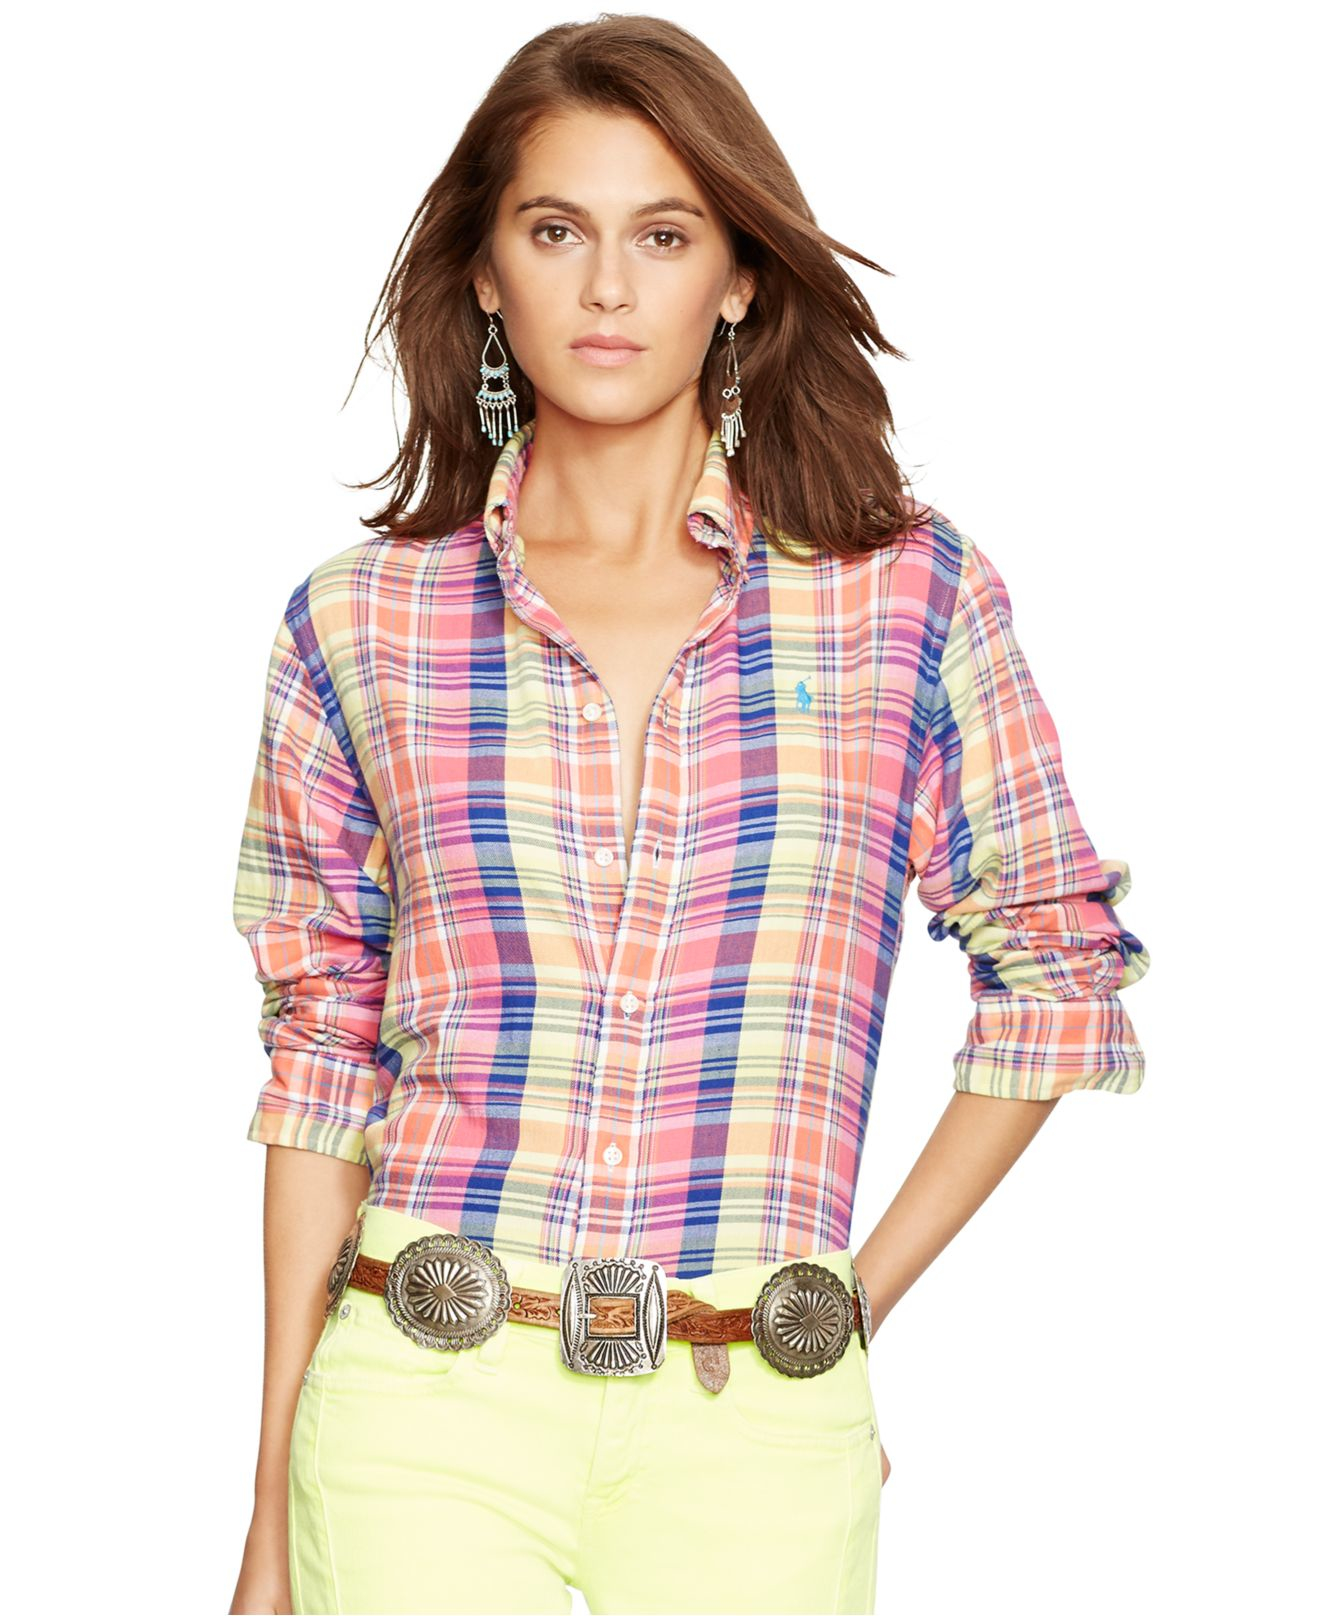 Lyst - Polo Ralph Lauren Relaxed-fit Cotton Plaid Shirt 7ae4848b7c